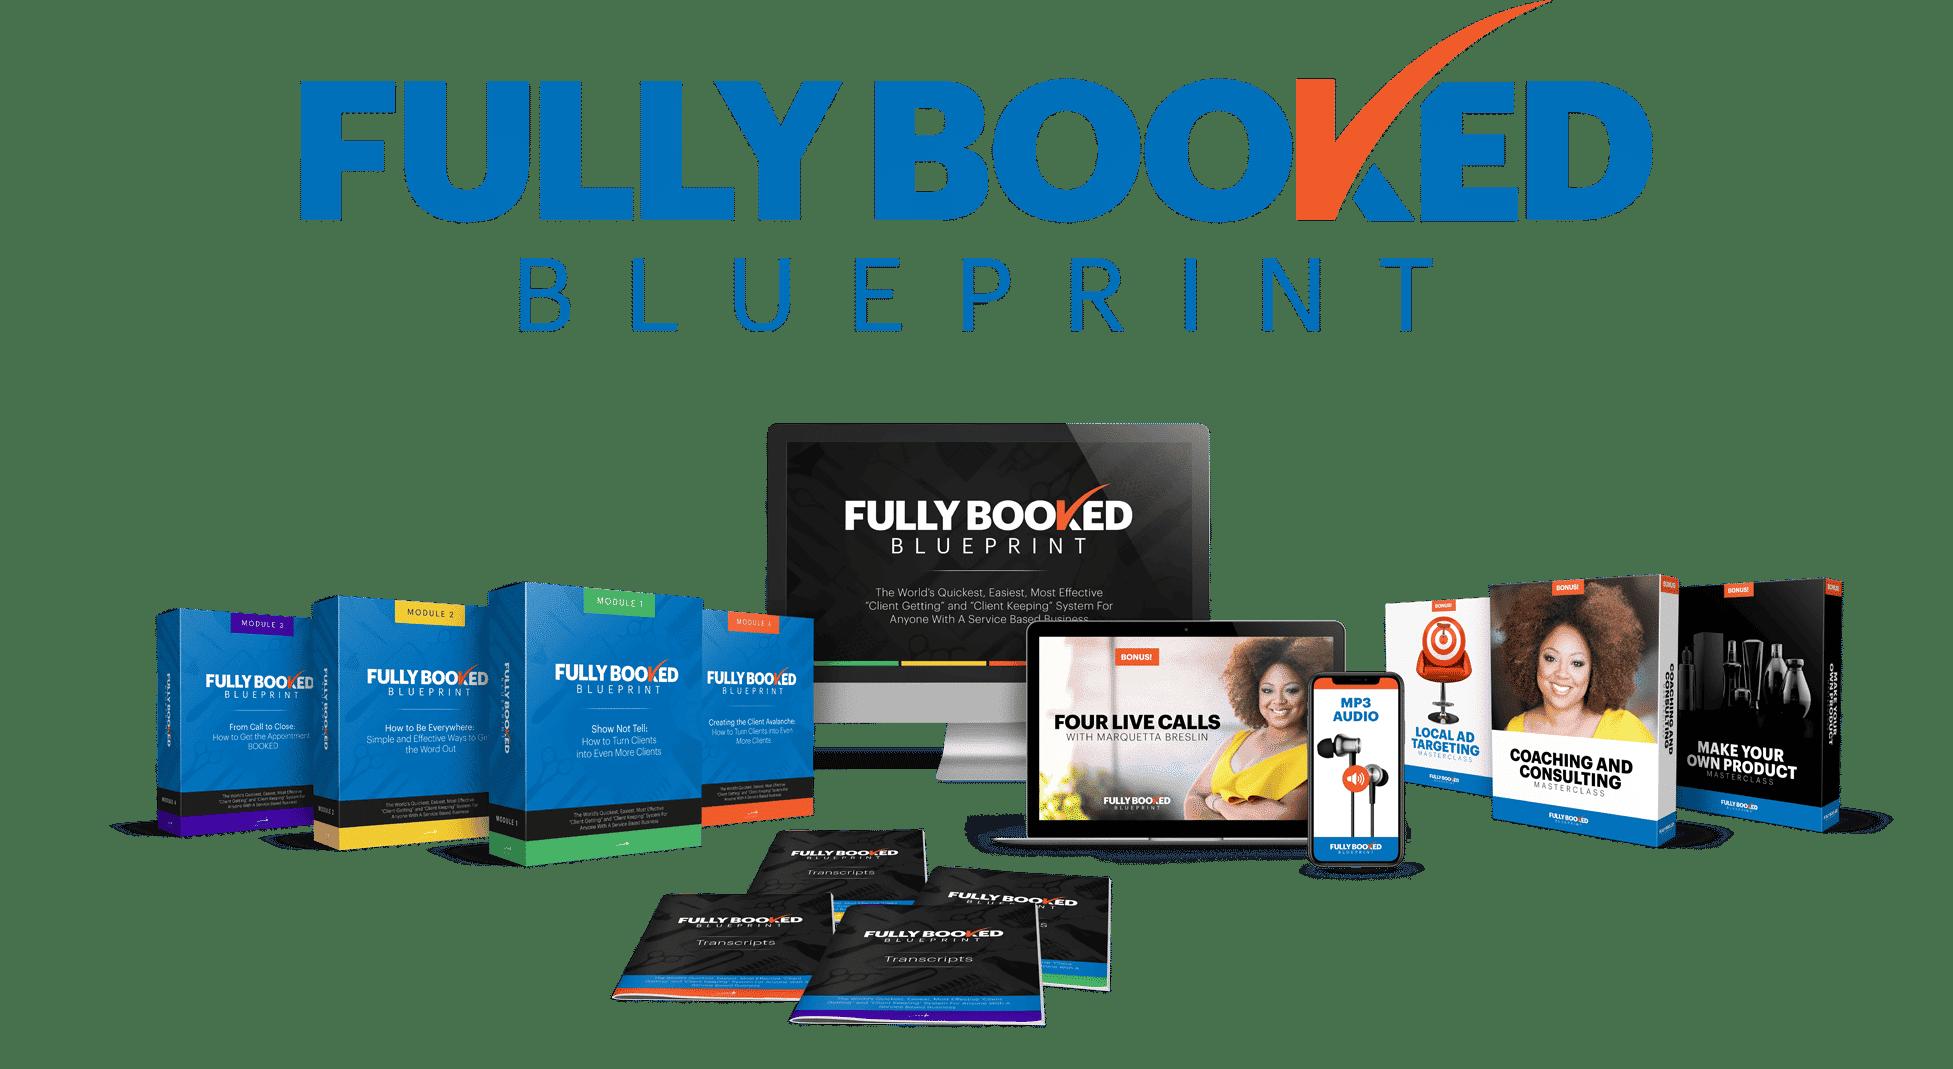 full-booked-blueprint